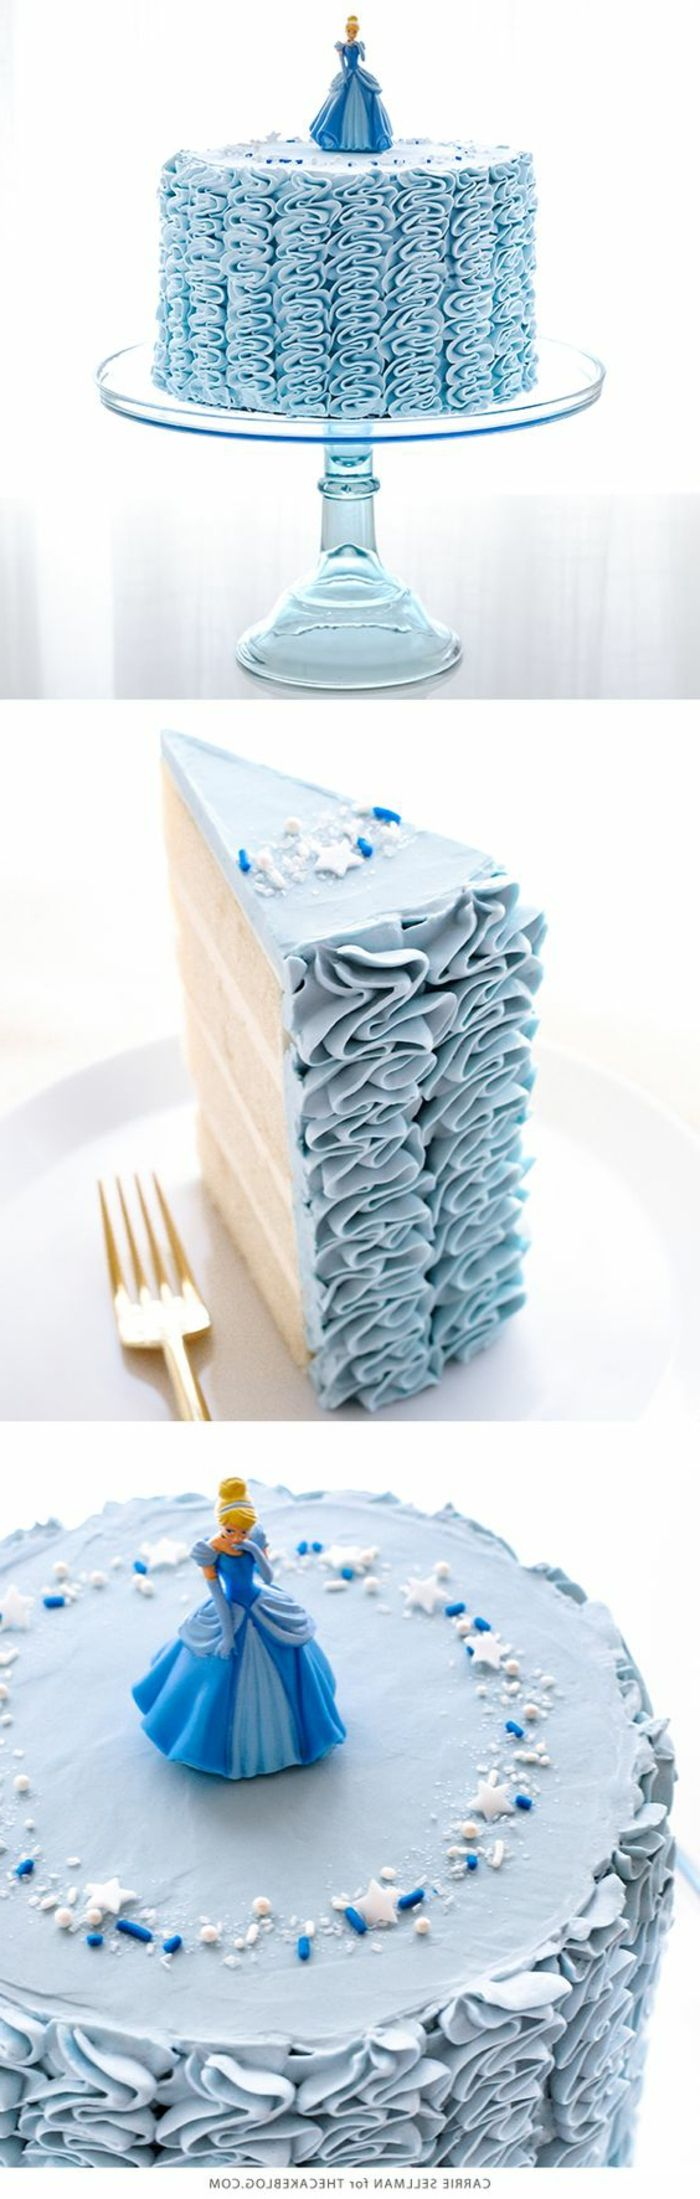 tartas-de-cumpleaños-dibujo-cenicienta-tarta-azul-niños-Disney